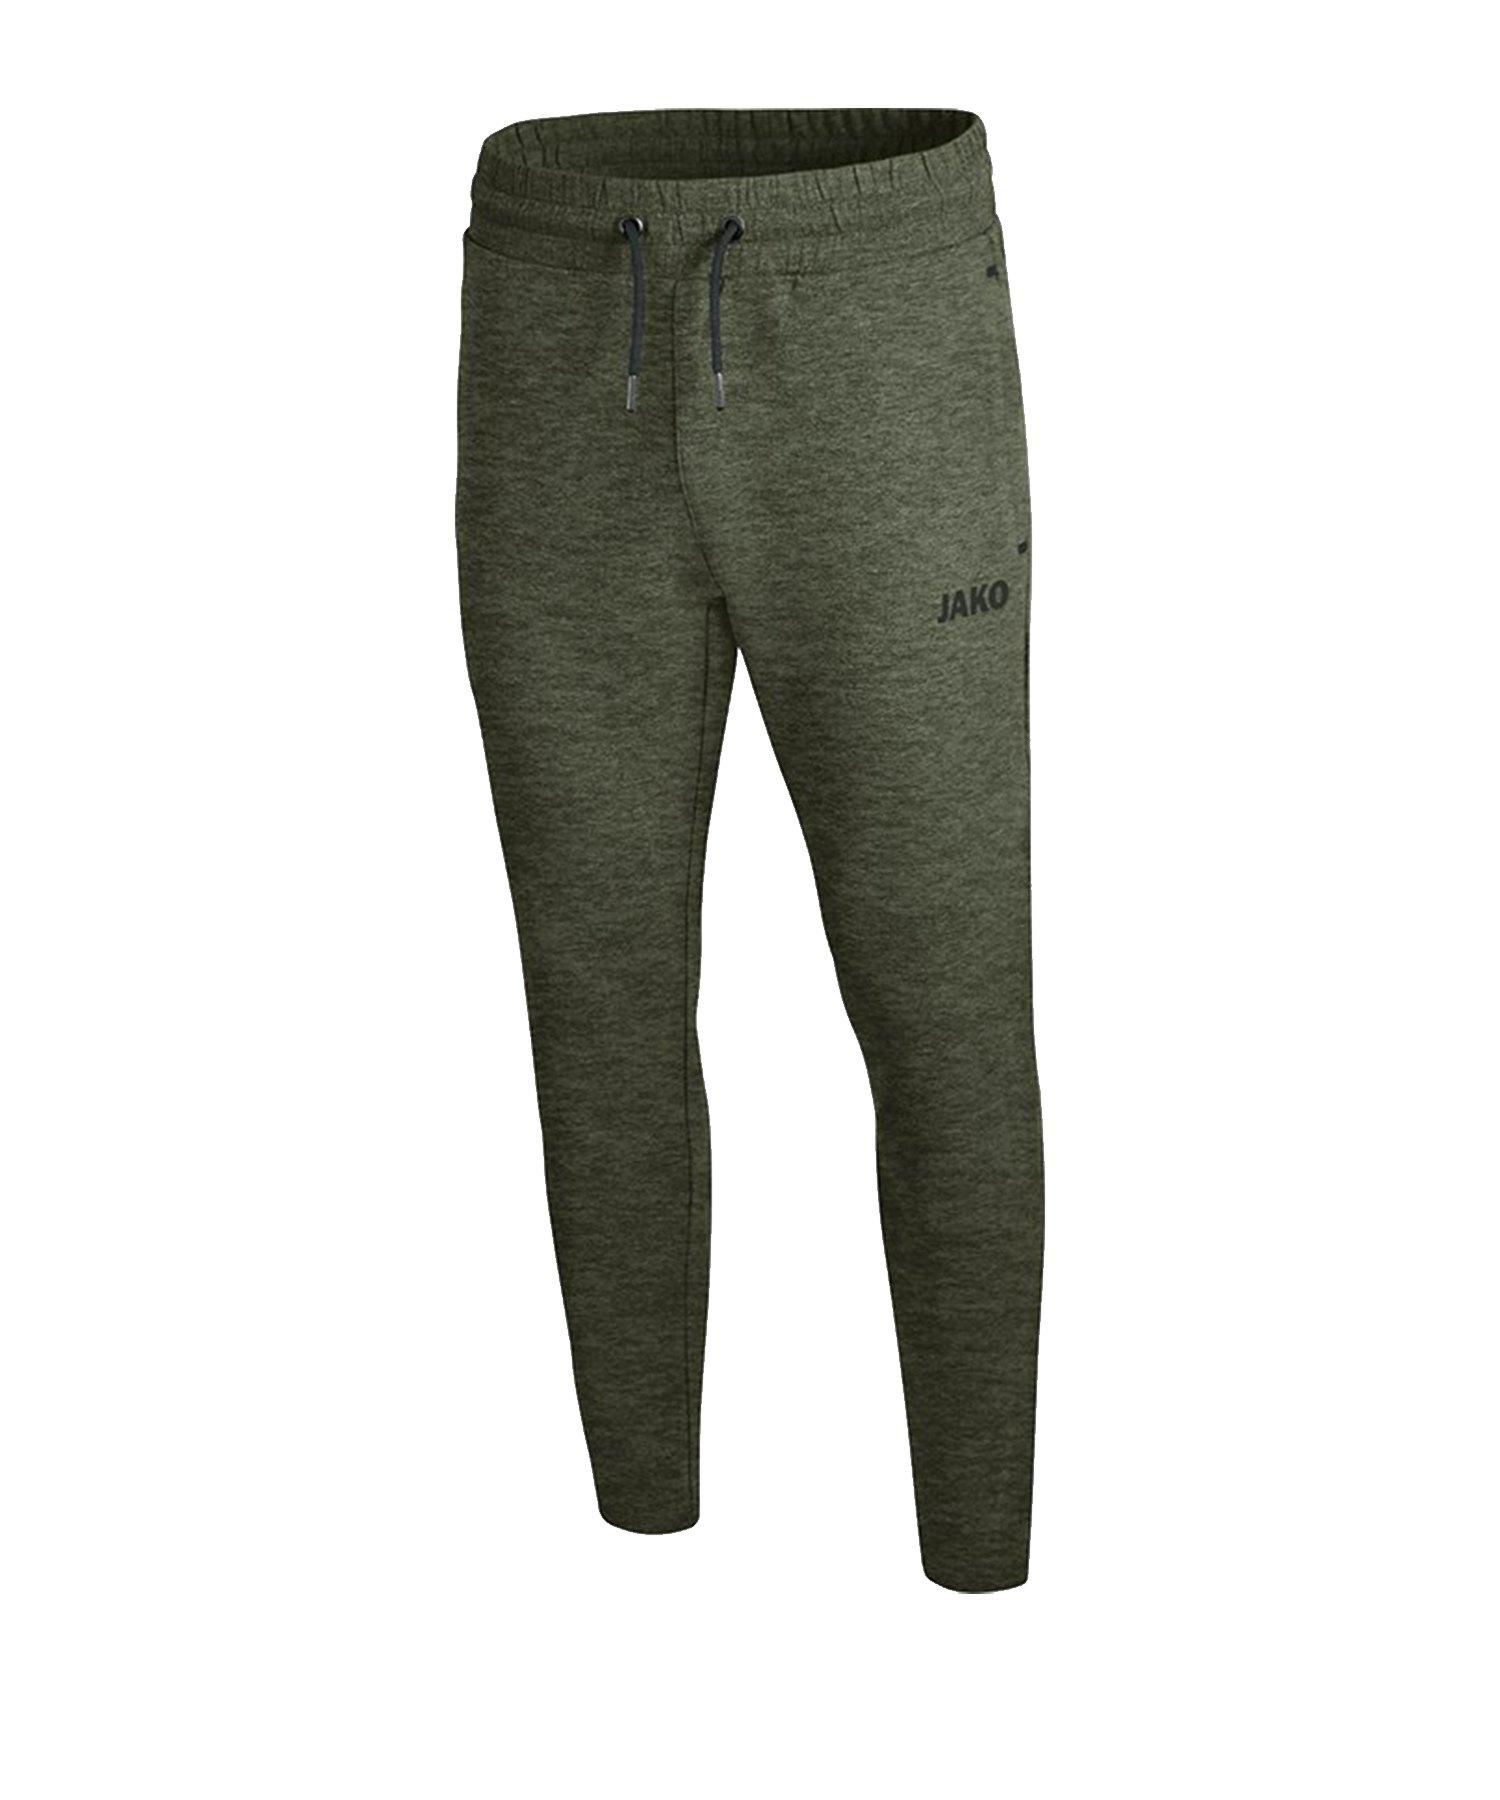 Jako Premium Basic Jogginghose Grün F28 - Gruen